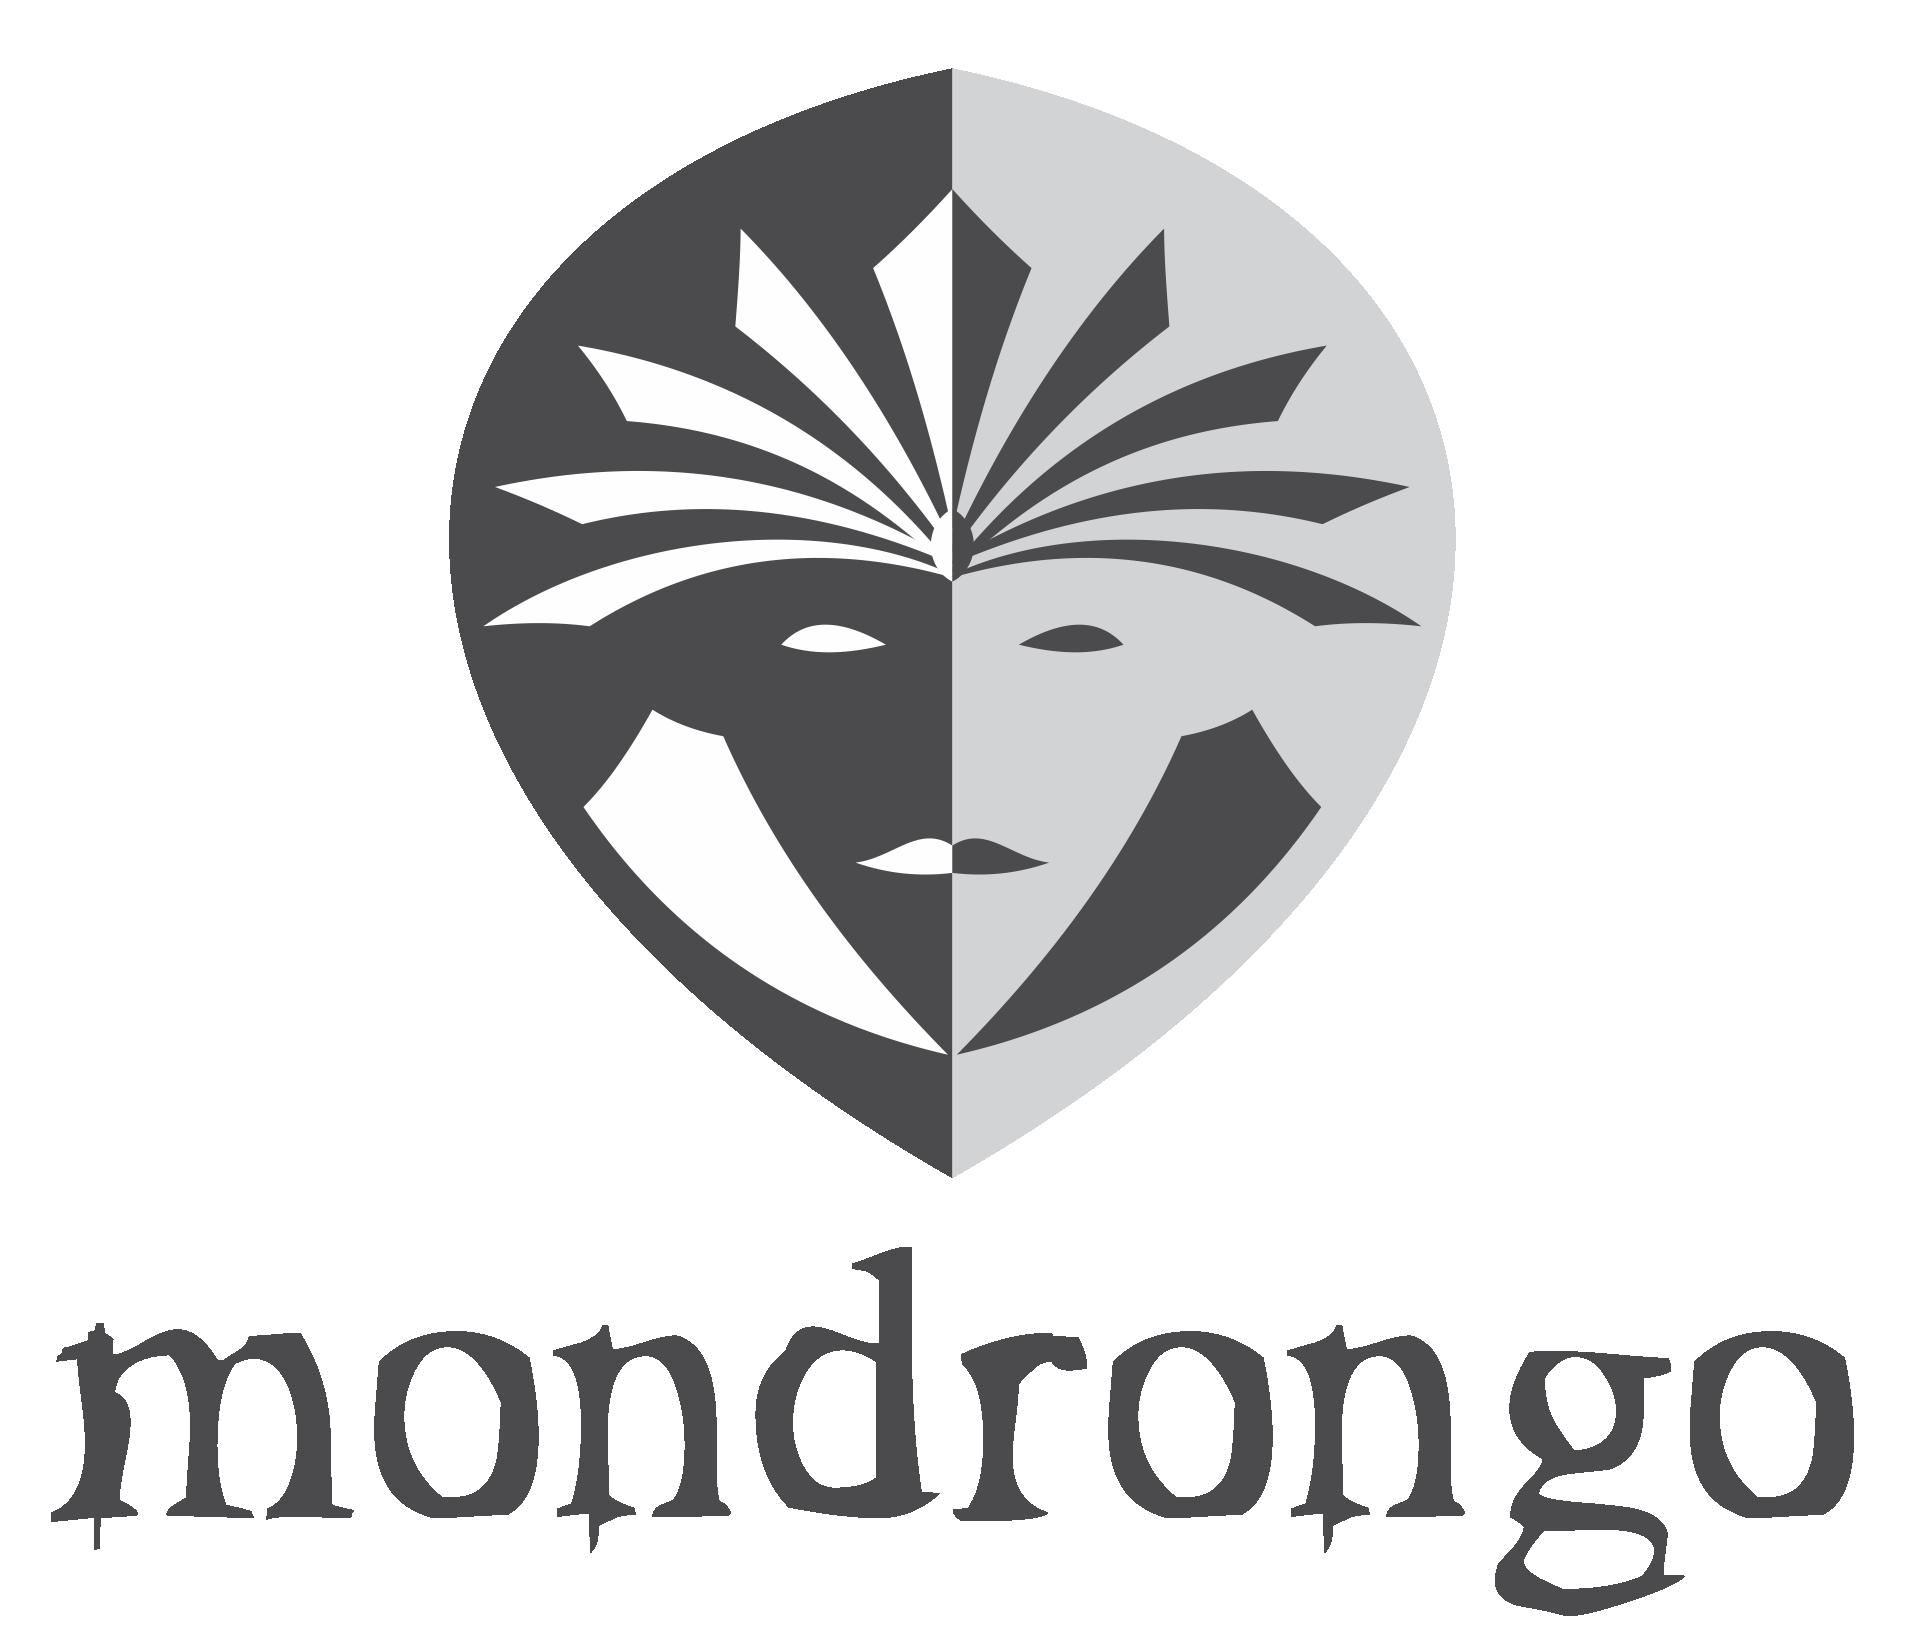 O Mercado Literário das Editoras Independentes | Editora Mondrongo